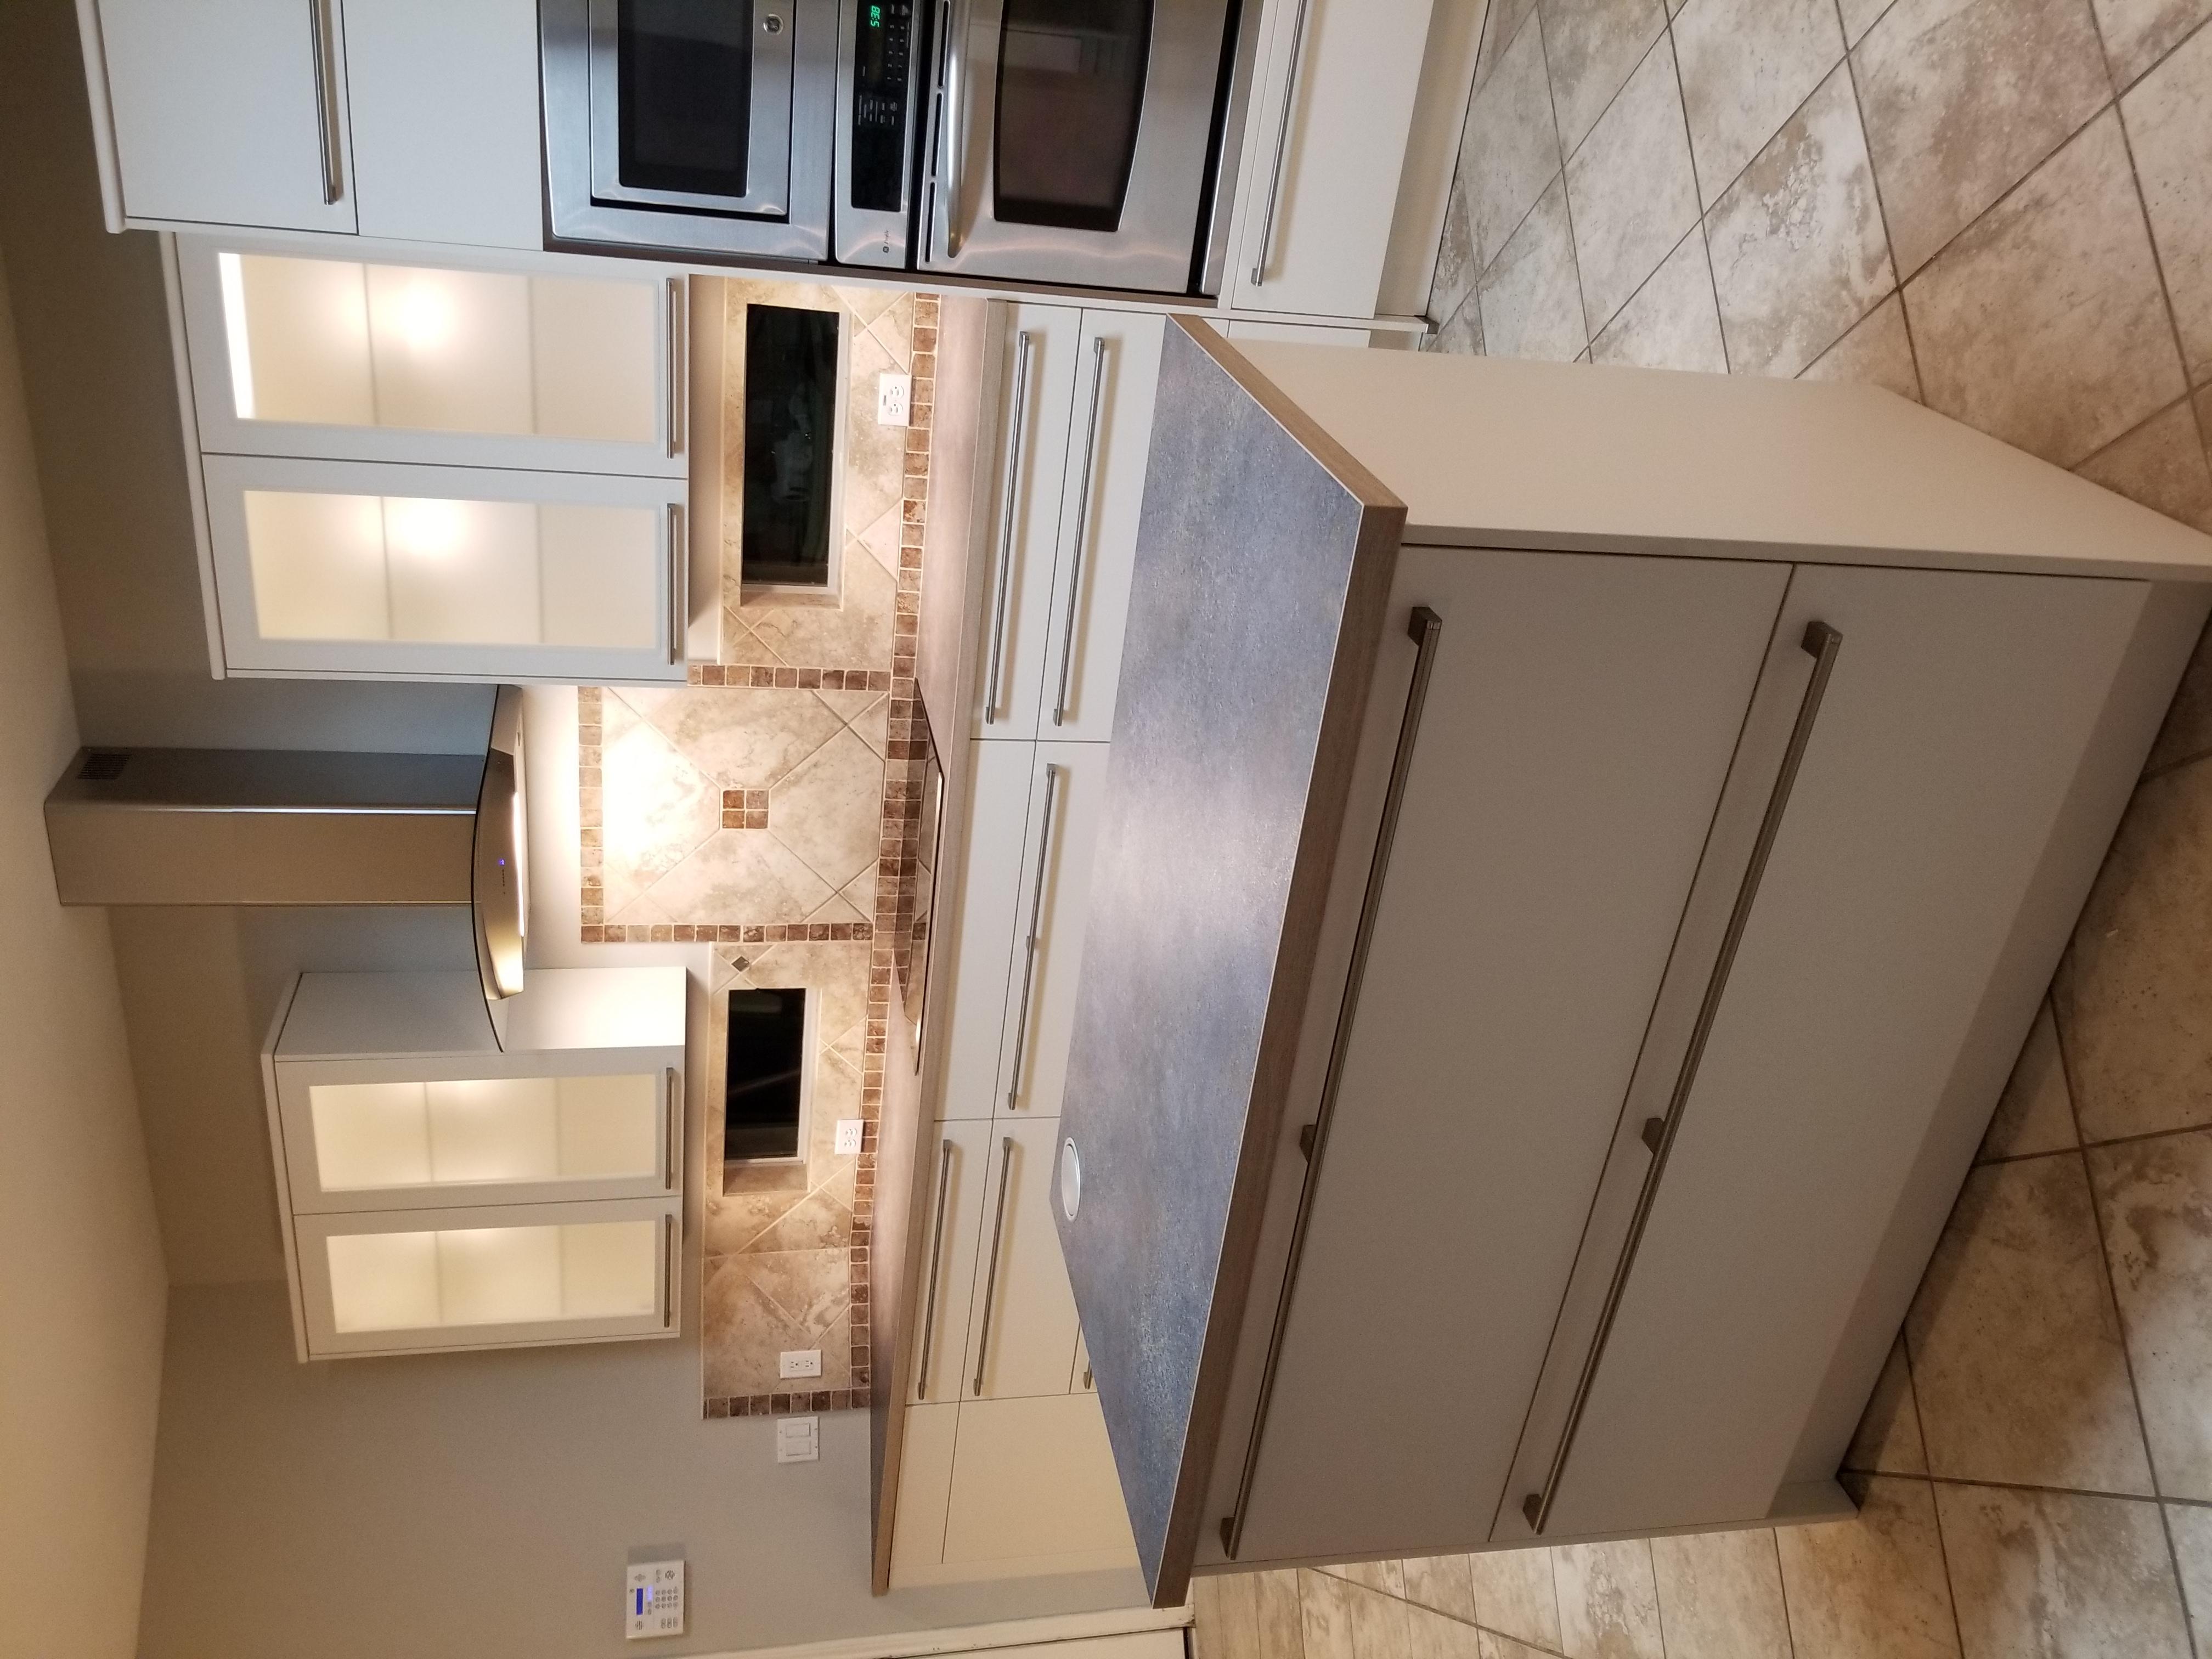 Stylish kitchen appliances in Texas